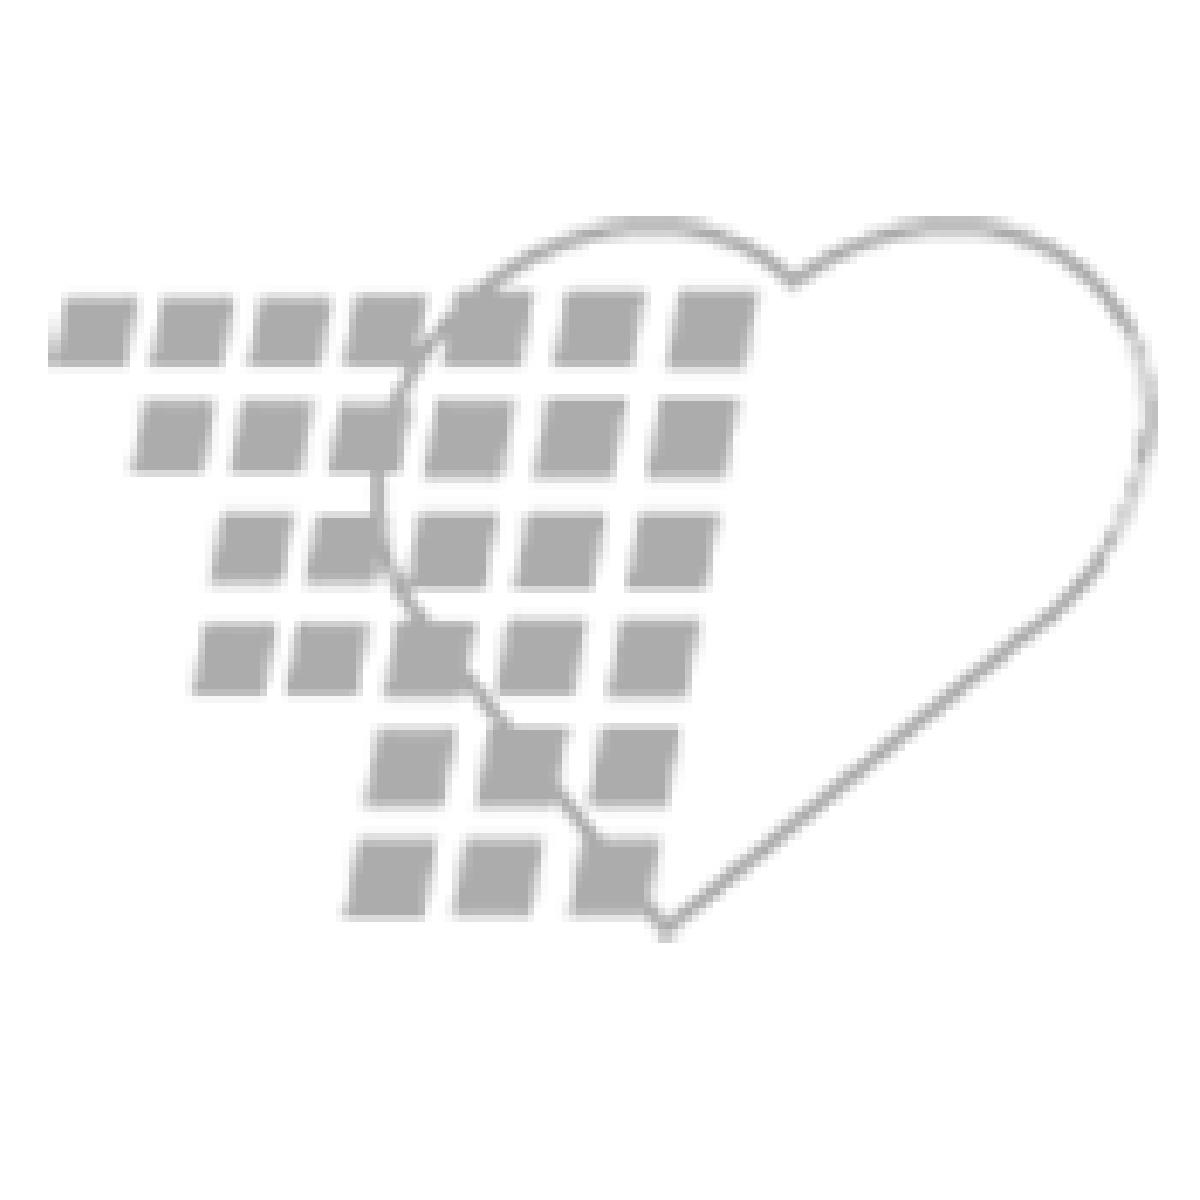 06-82-5053 Tension Pneumothorax Access Kit (TPAK)